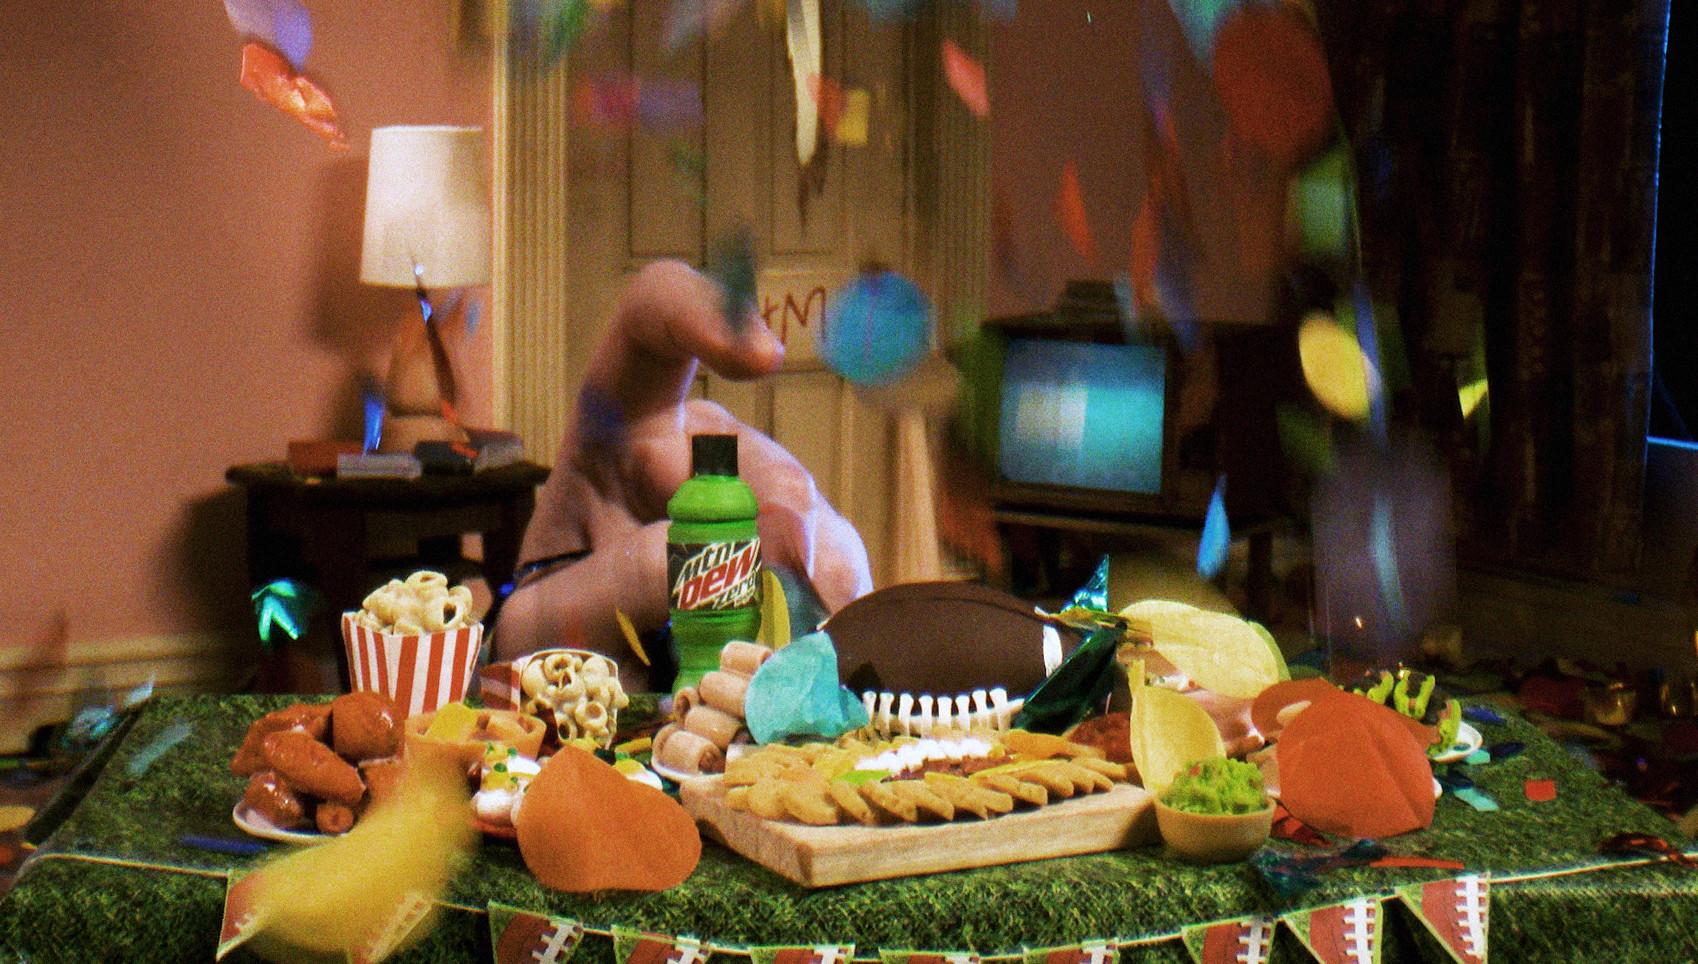 Tony's Super Bowl Watch Party